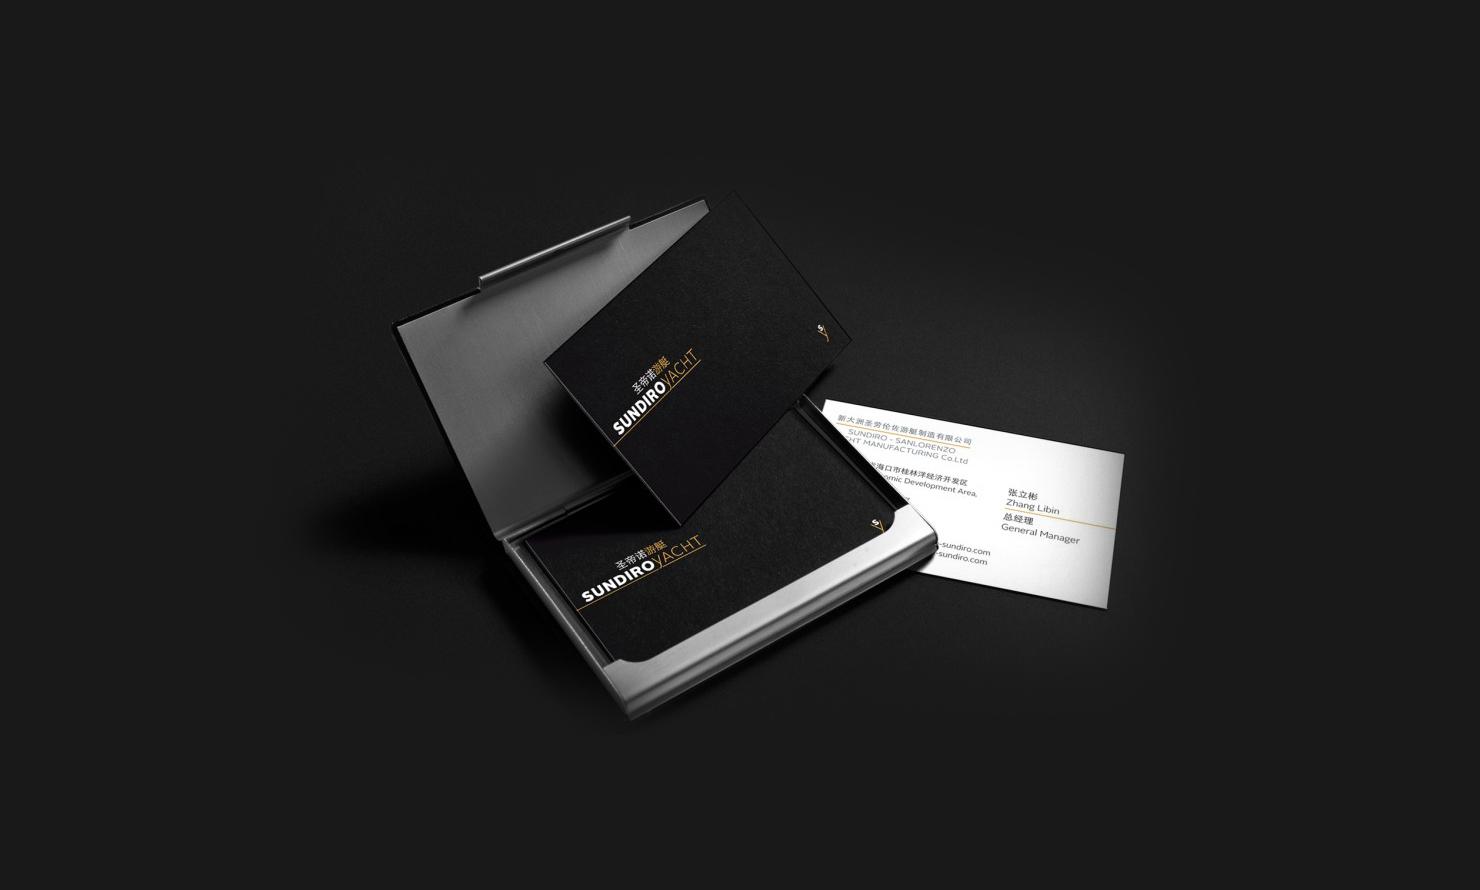 https://www.kubelibre.com/uploads/Slider-work-tutti-clienti/sundiro-yacht-l-eccelenza-italiana-sbarca-in-cina-2.jpg